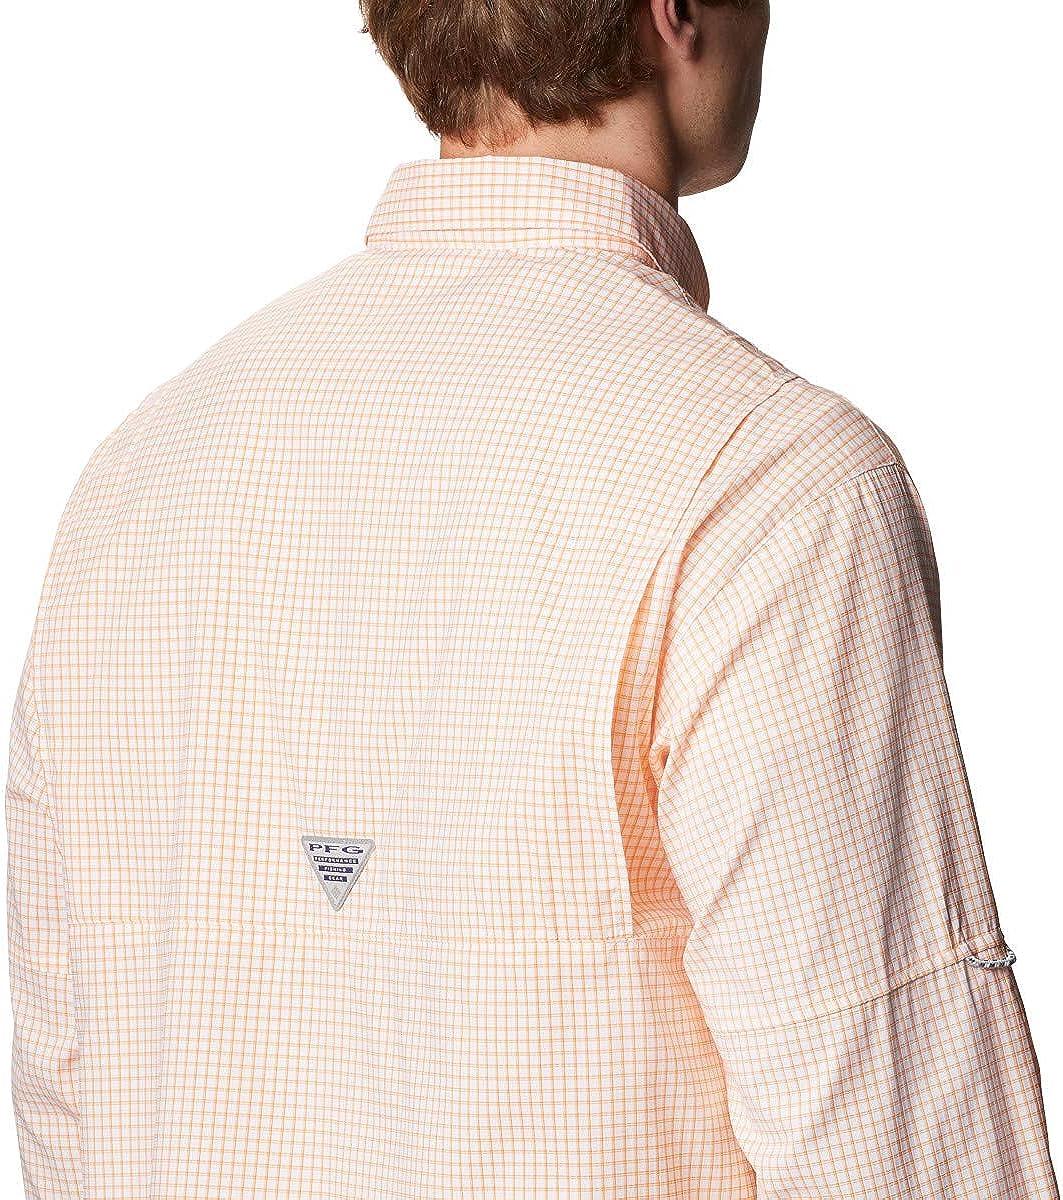 Columbia Mens Collegiate Super Tamiami Long Sleeve Shirt